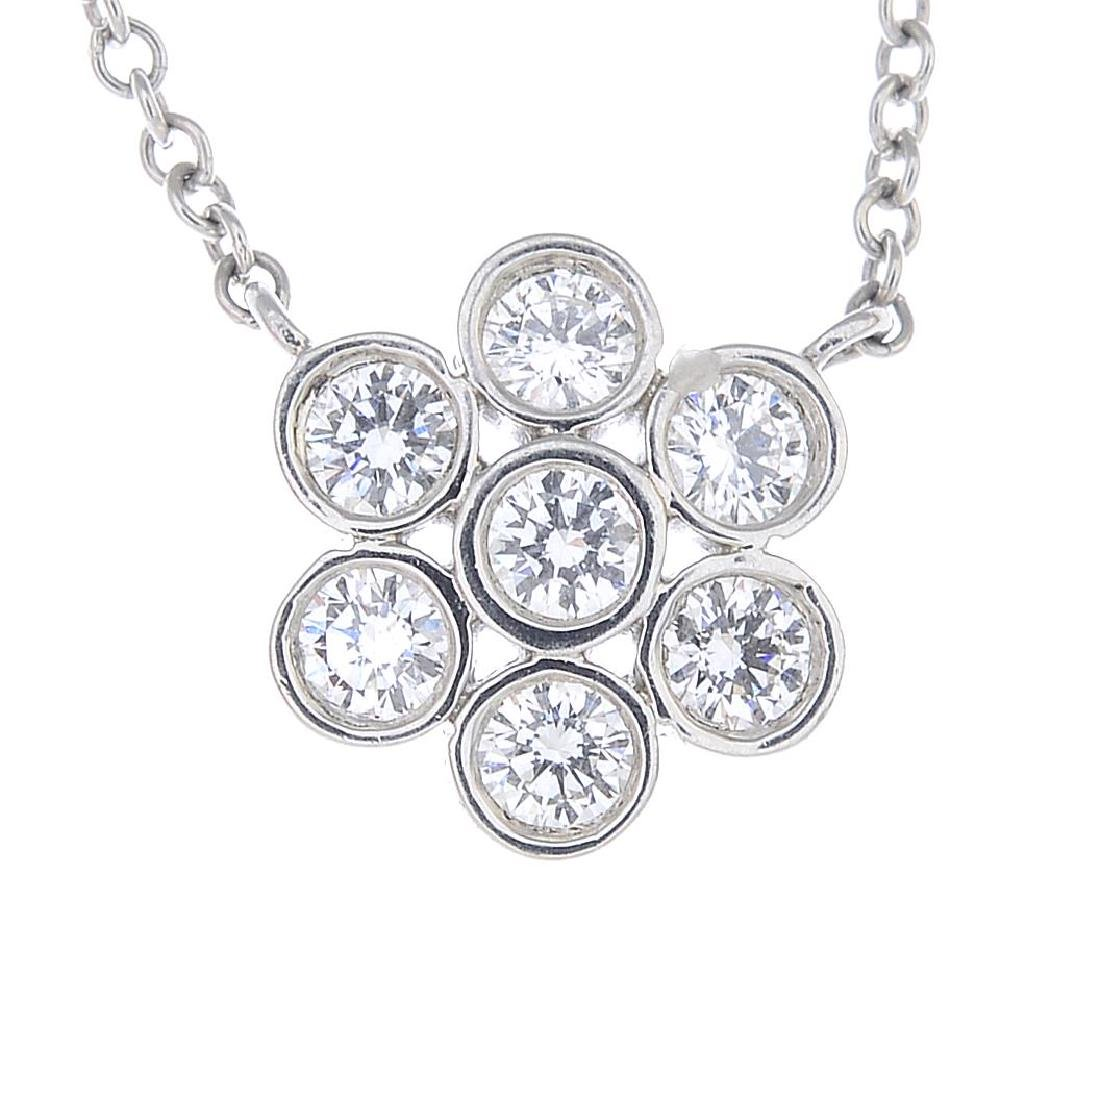 TIFFANY & CO. - a diamond 'Enchant' cluster necklace.